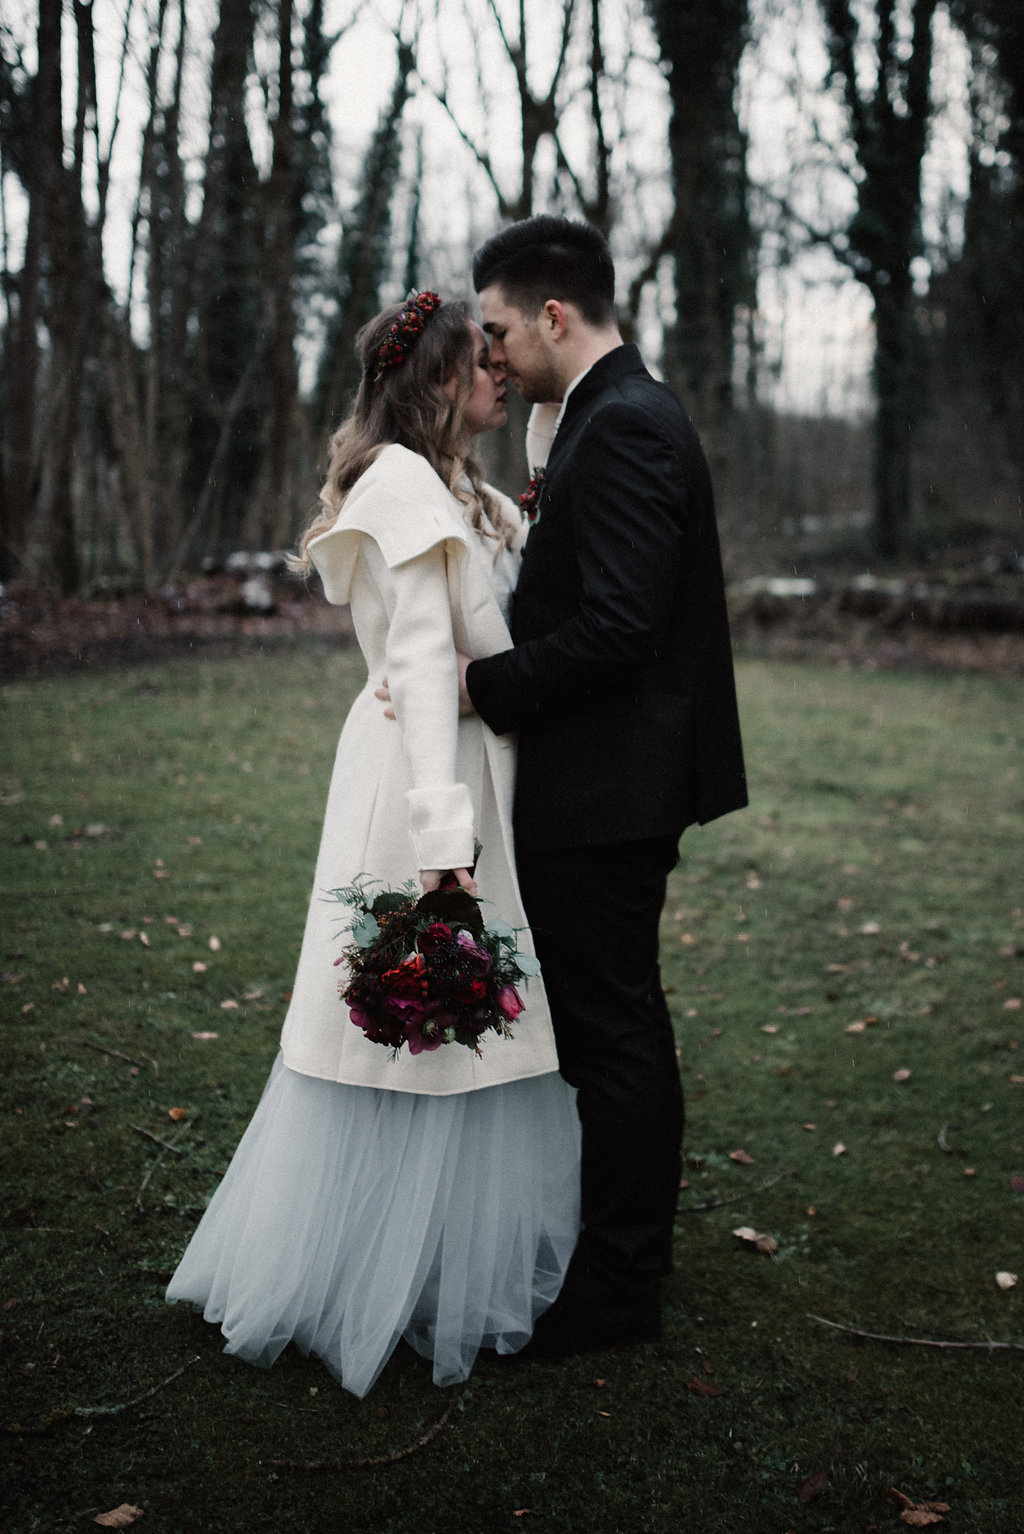 Brautmantel zum Brautkleid (Foto: Josee Lamarre)